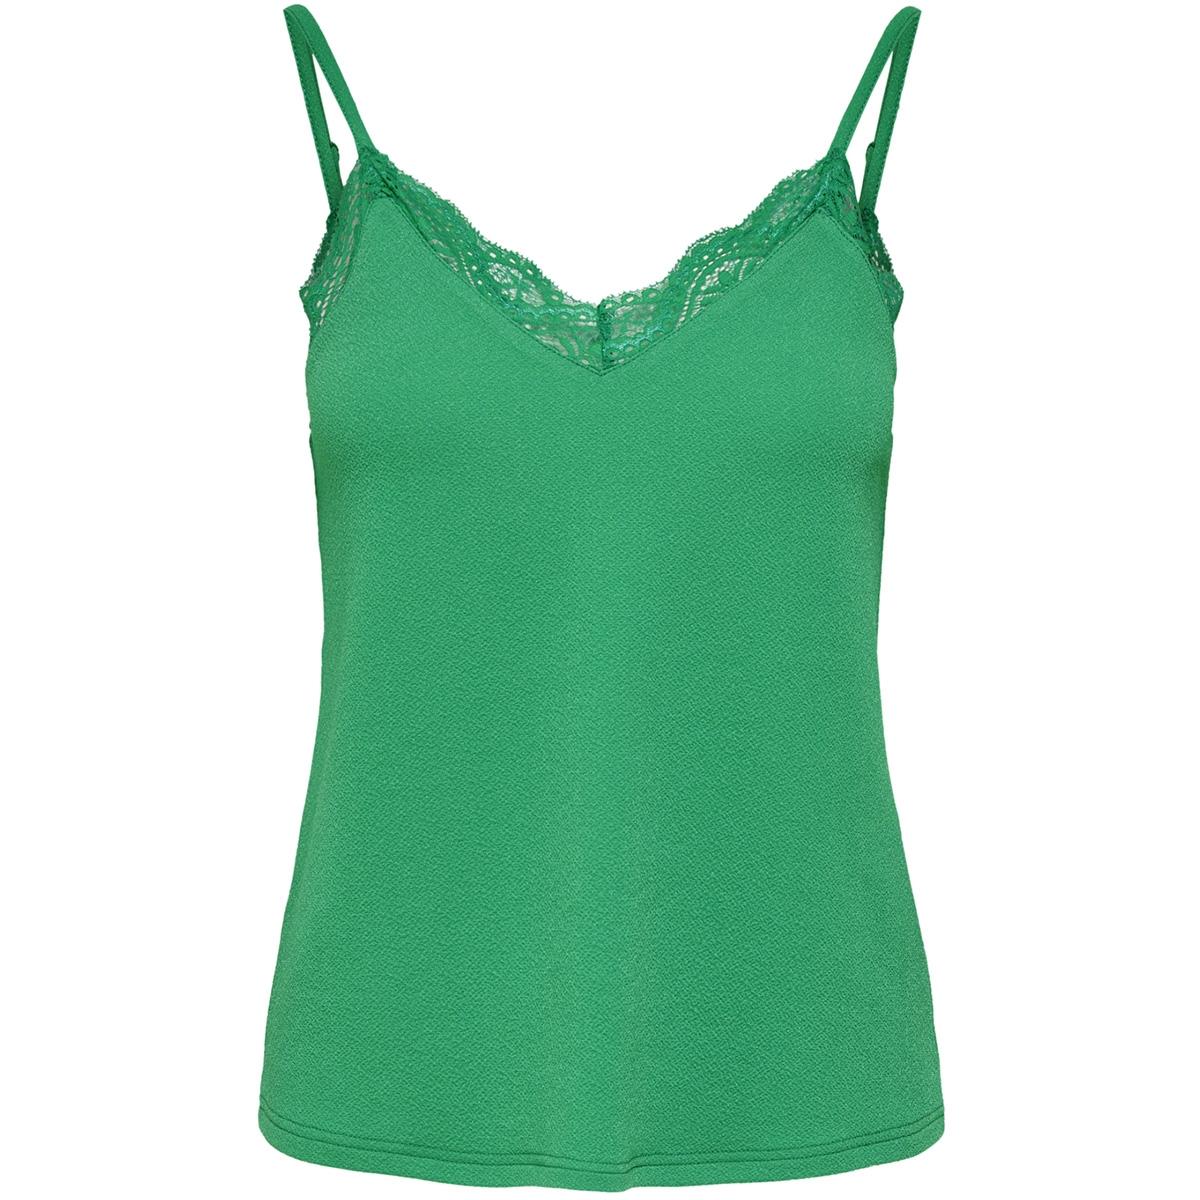 jdylexi strap top jrs 15174707 jacqueline de yong top simply green